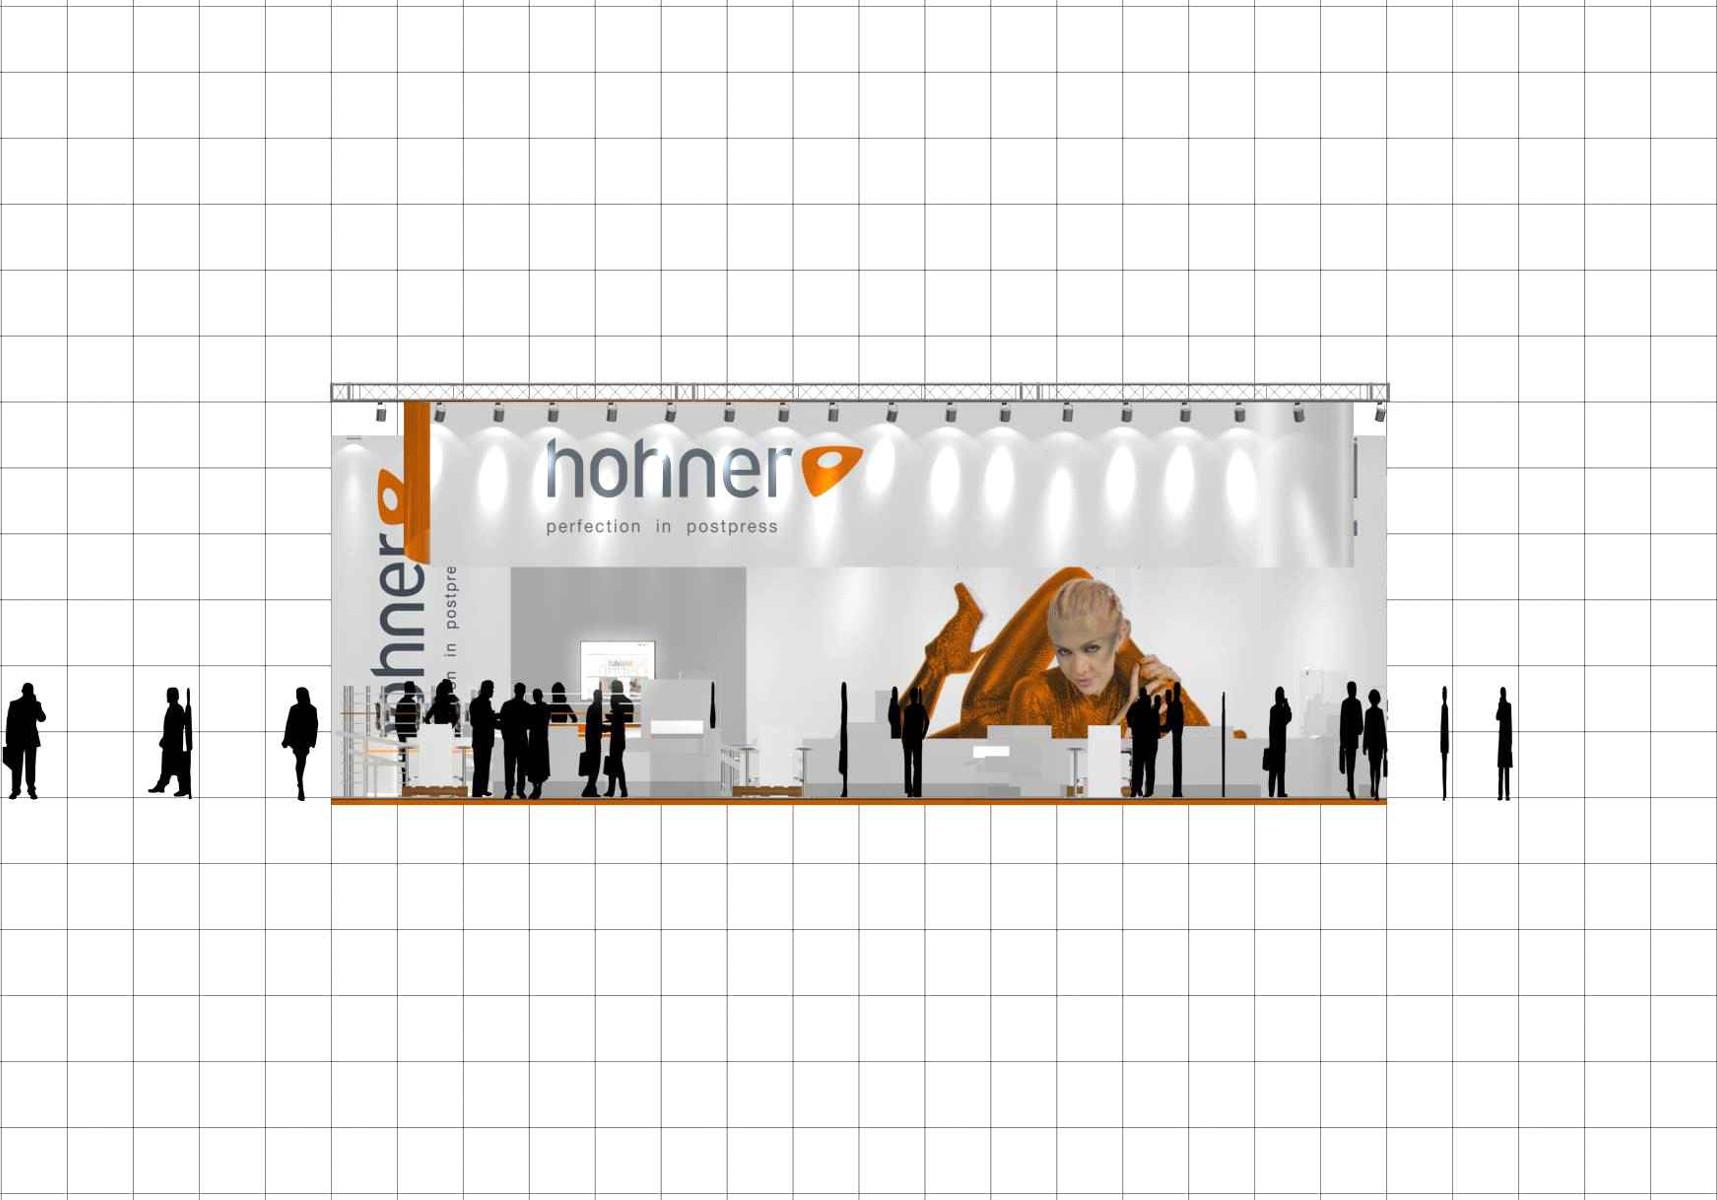 Hohner Messestand Drupa Düsseldorf Höhenschnitt 2